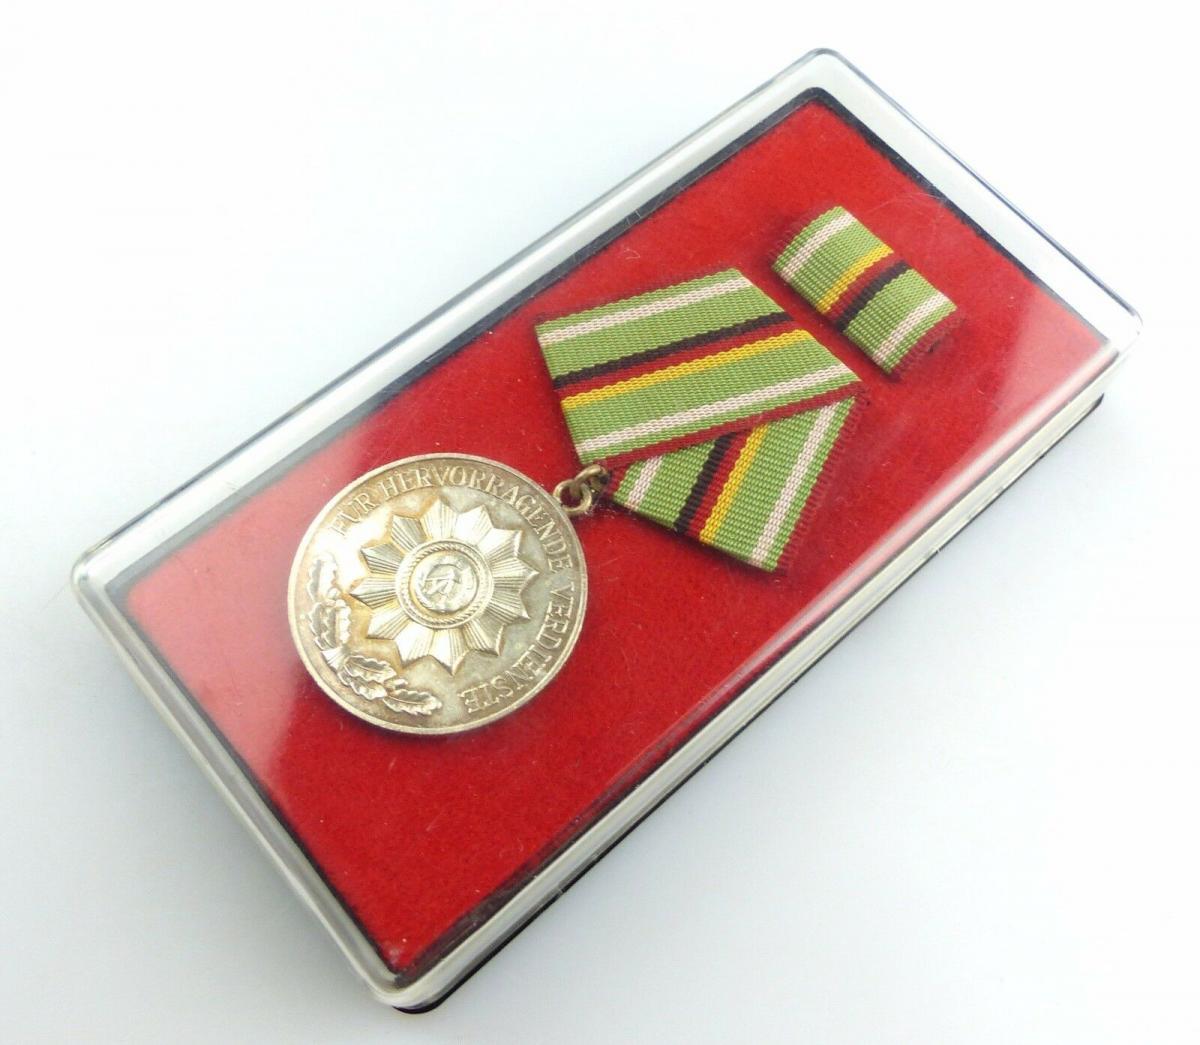 #e5593 Verdienstmedaille der Organe des MdI in Silber vgl. Band I Nr. 212 a